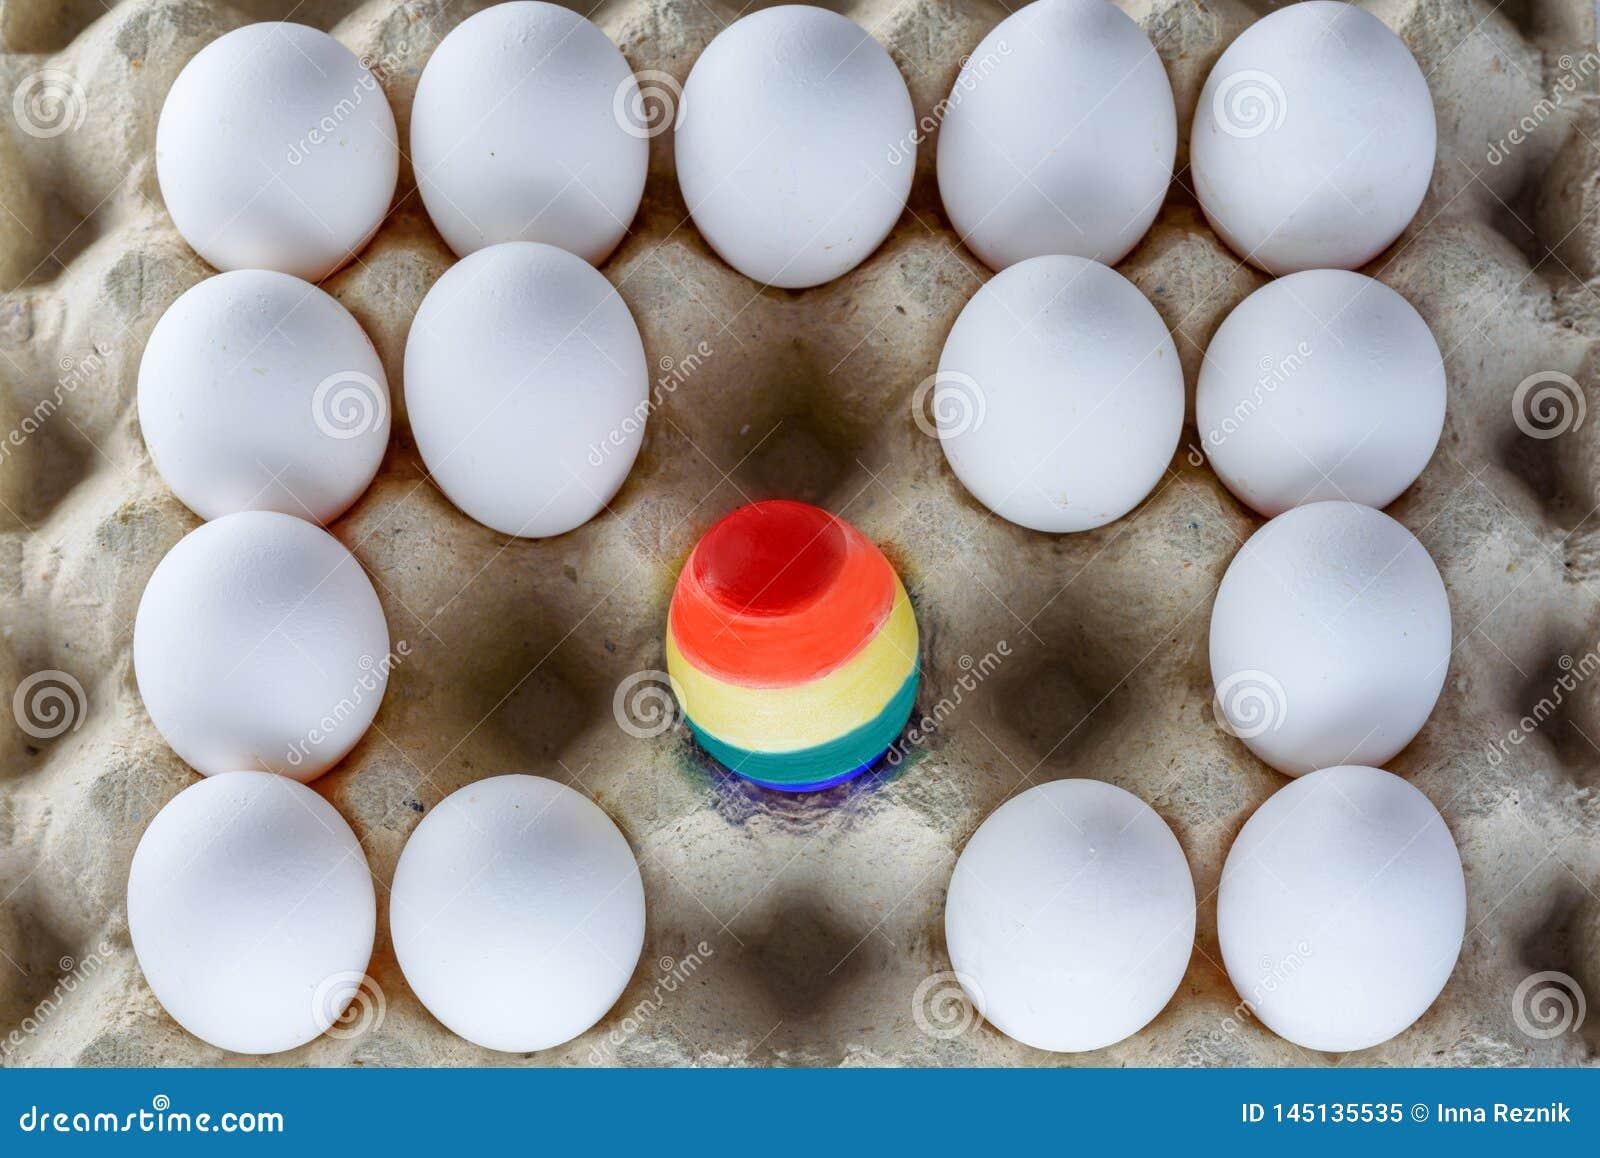 Egg painted like a LGBT flag. Pride month LGBT rights lesbian gay bisexual transgender. Rainbow flag symbol Pride month.